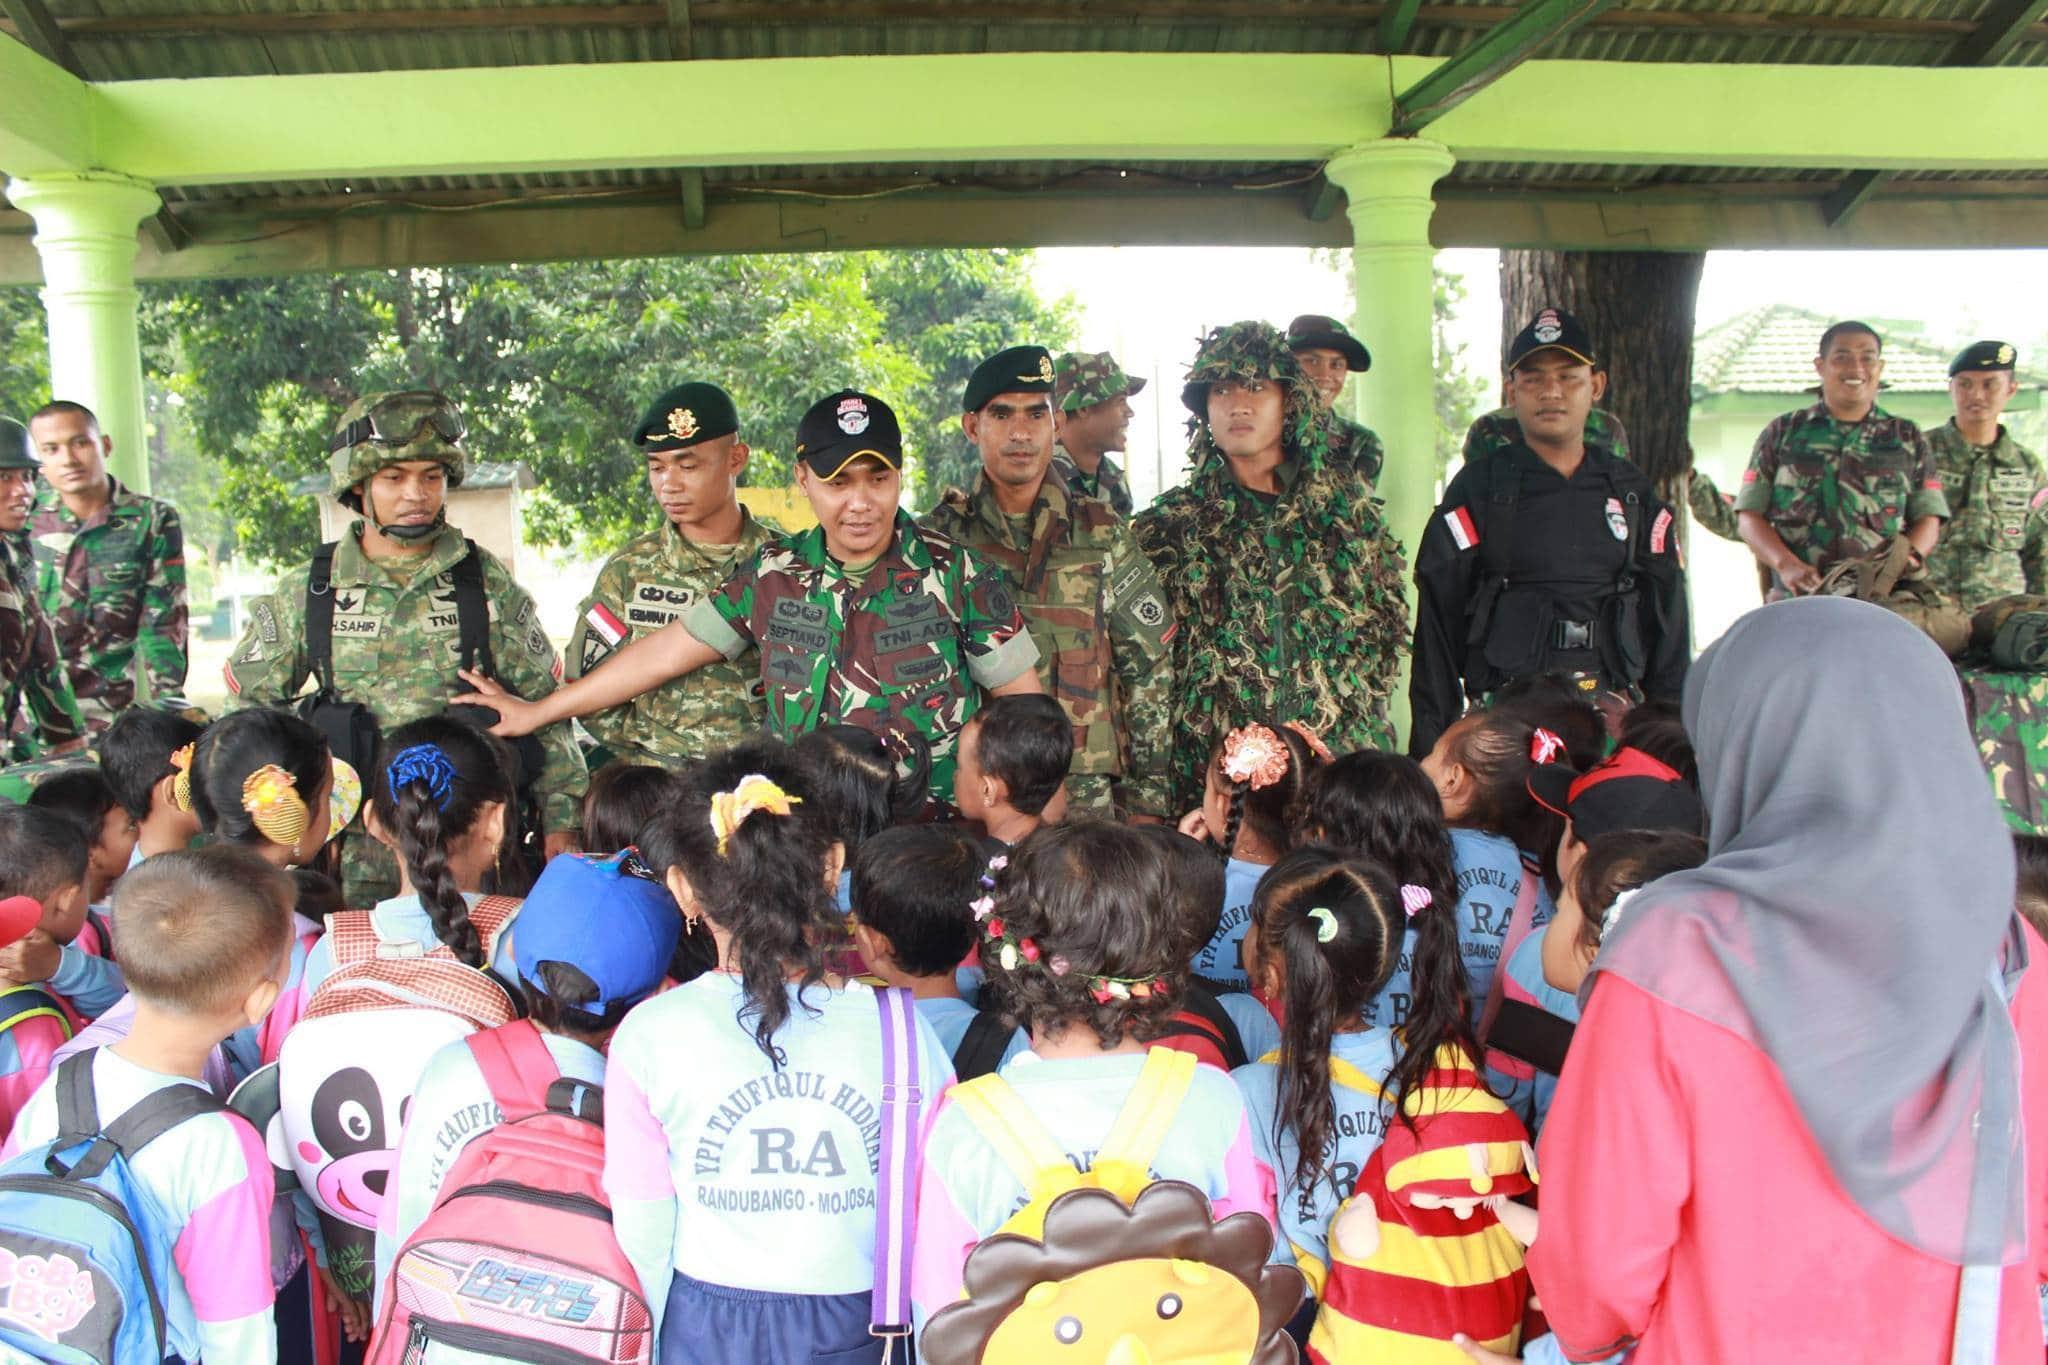 Siswa TK Roudhlatul Atfhal Taufiqul Hidayah Kunjungi Batalyon Yonif Linud 503 16-2-16 6